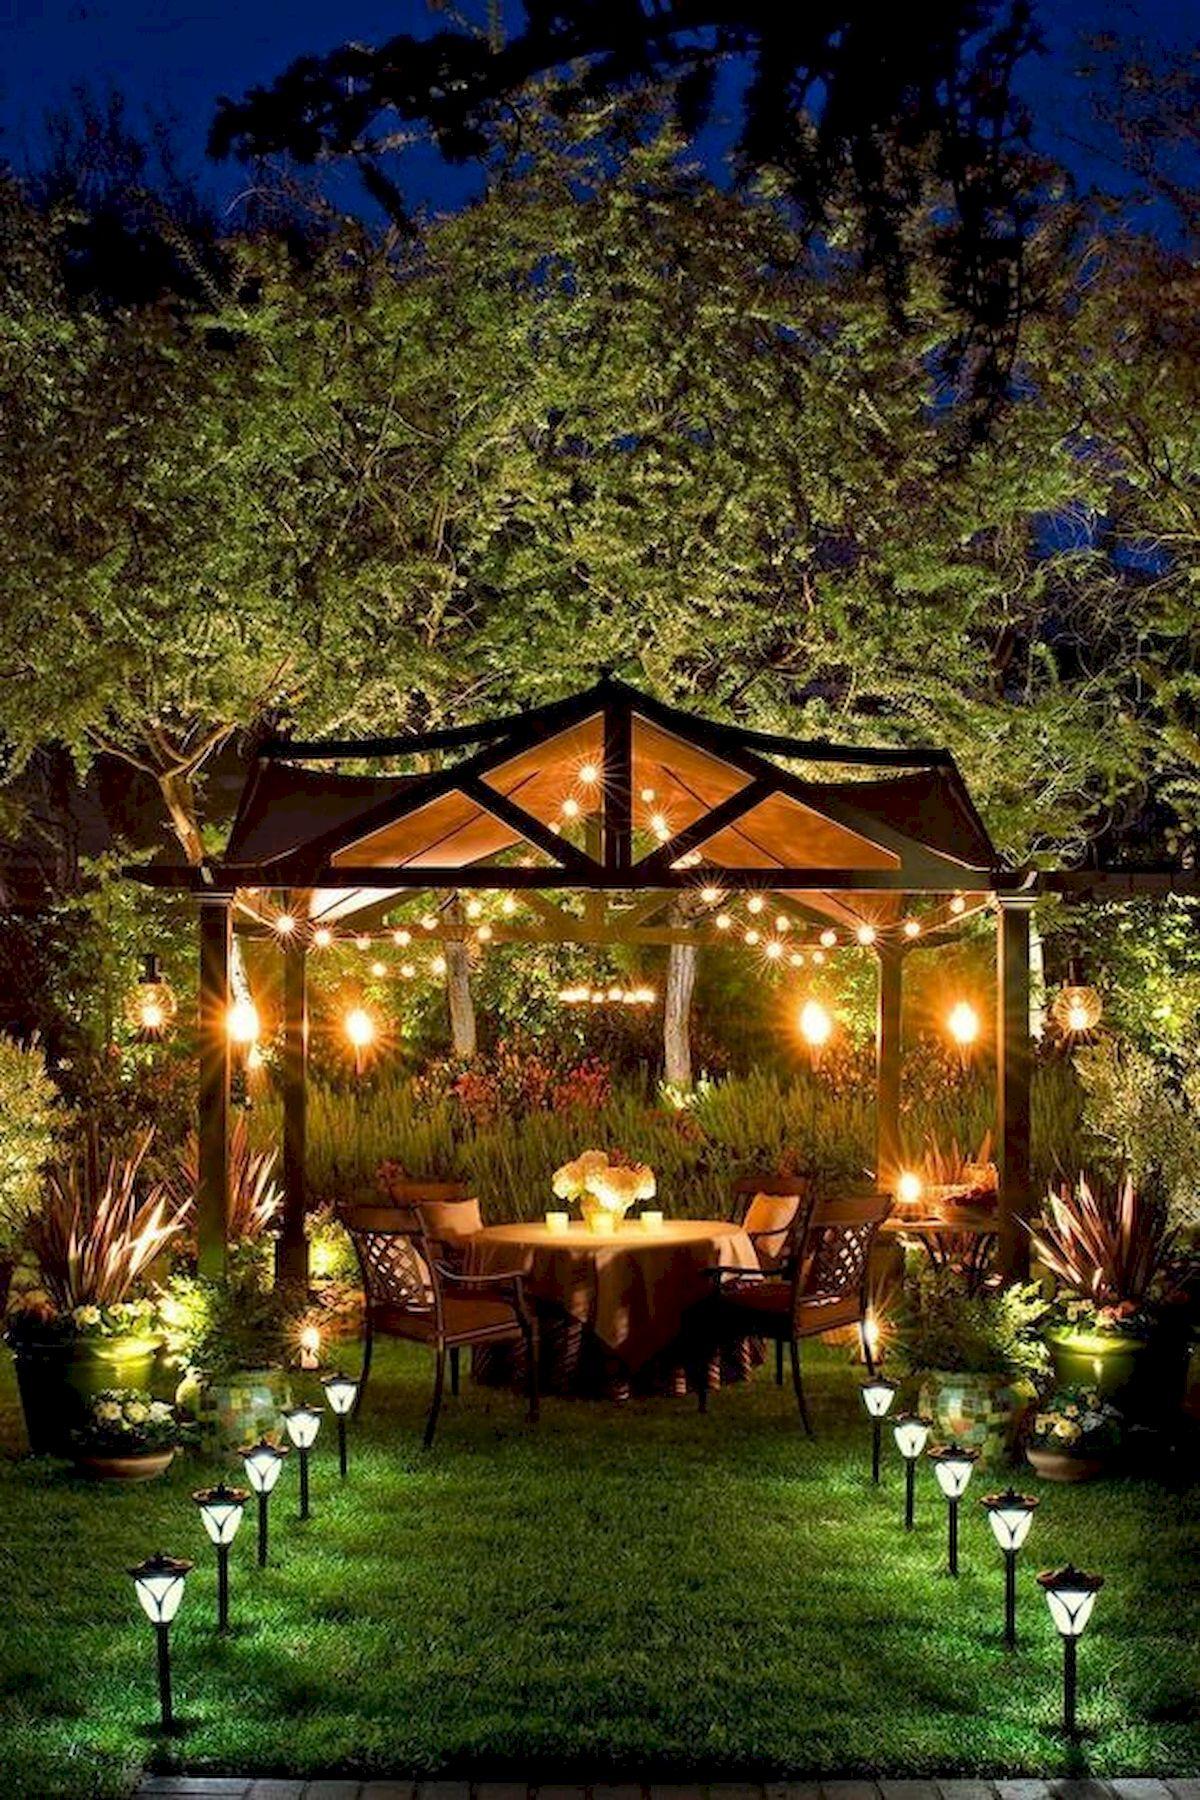 sfeerverlichting-achtertuin-ideeen